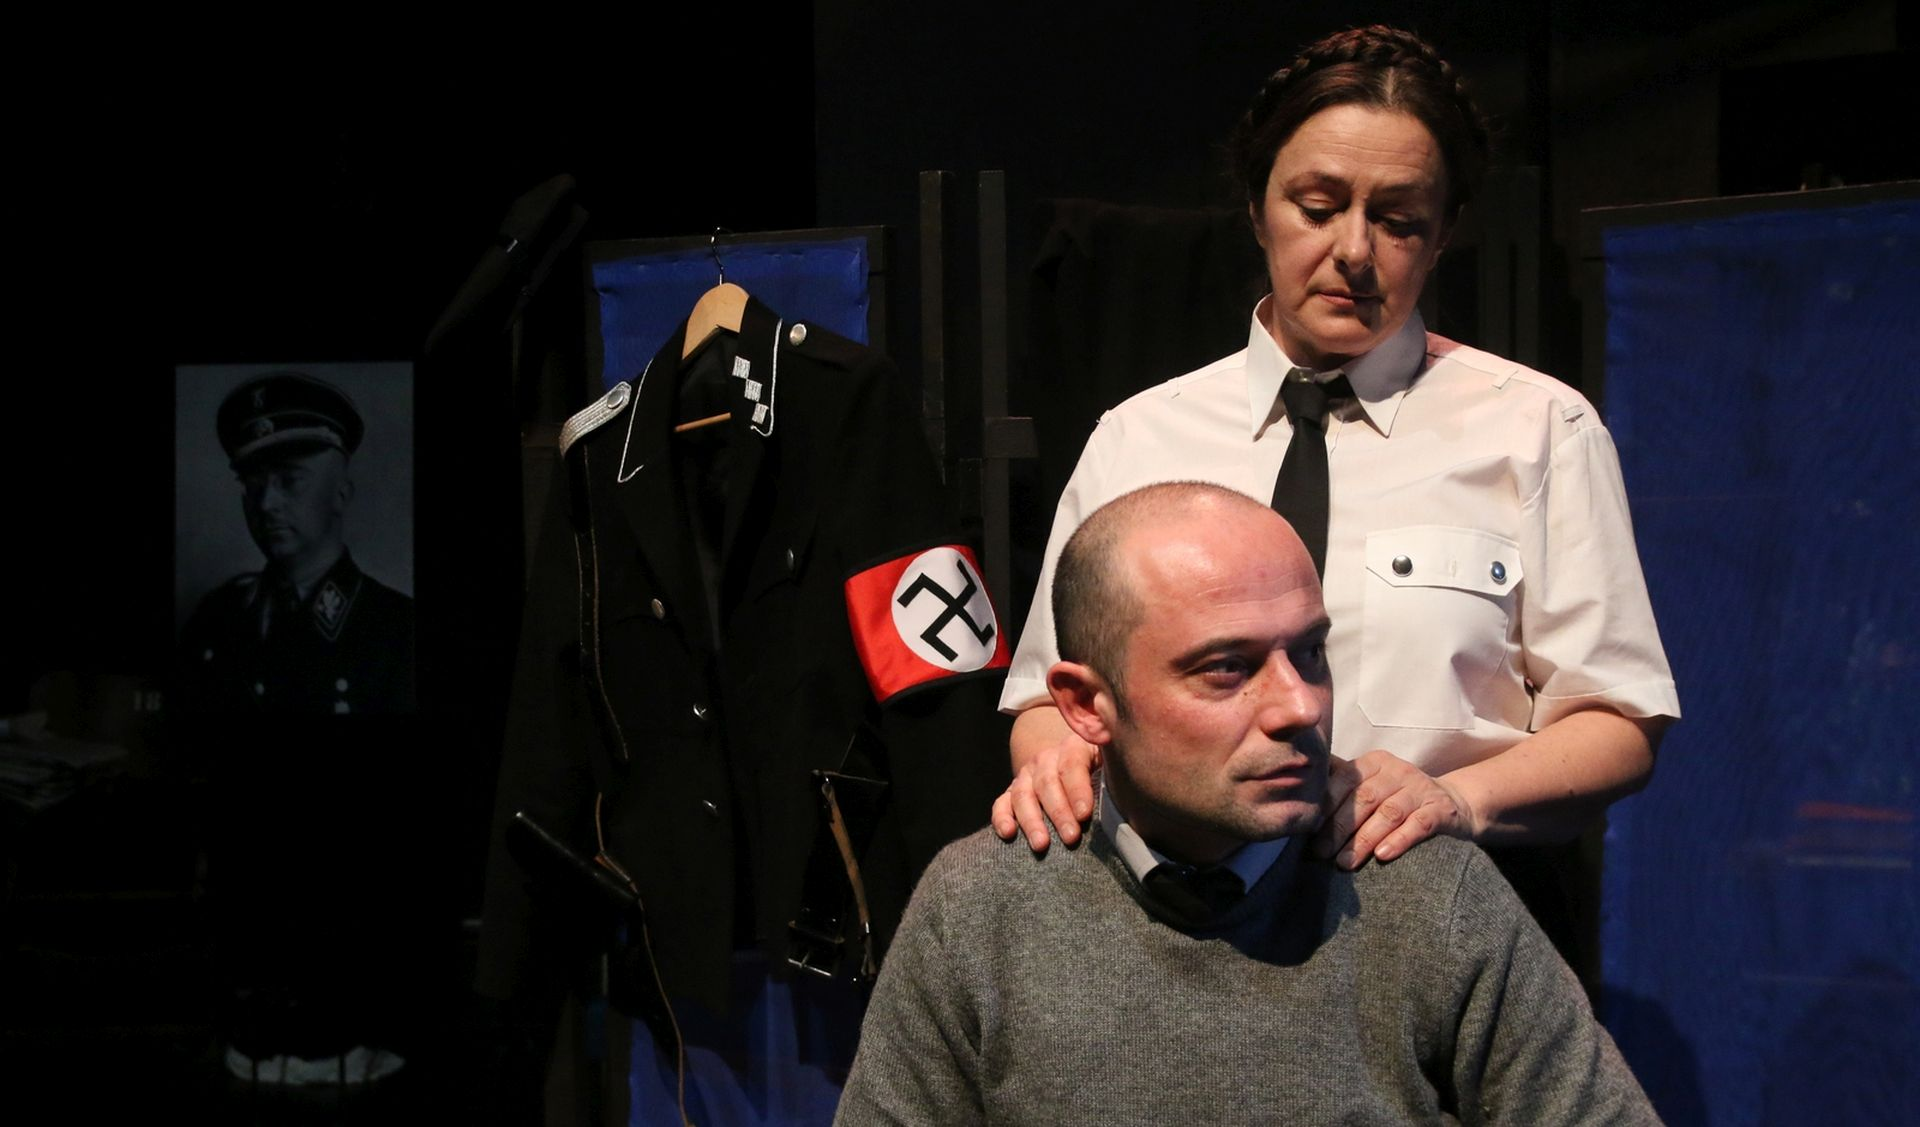 FOTO: 'PRED MIROVINOM' Premijera drame o preživljavanju razorne ideologije